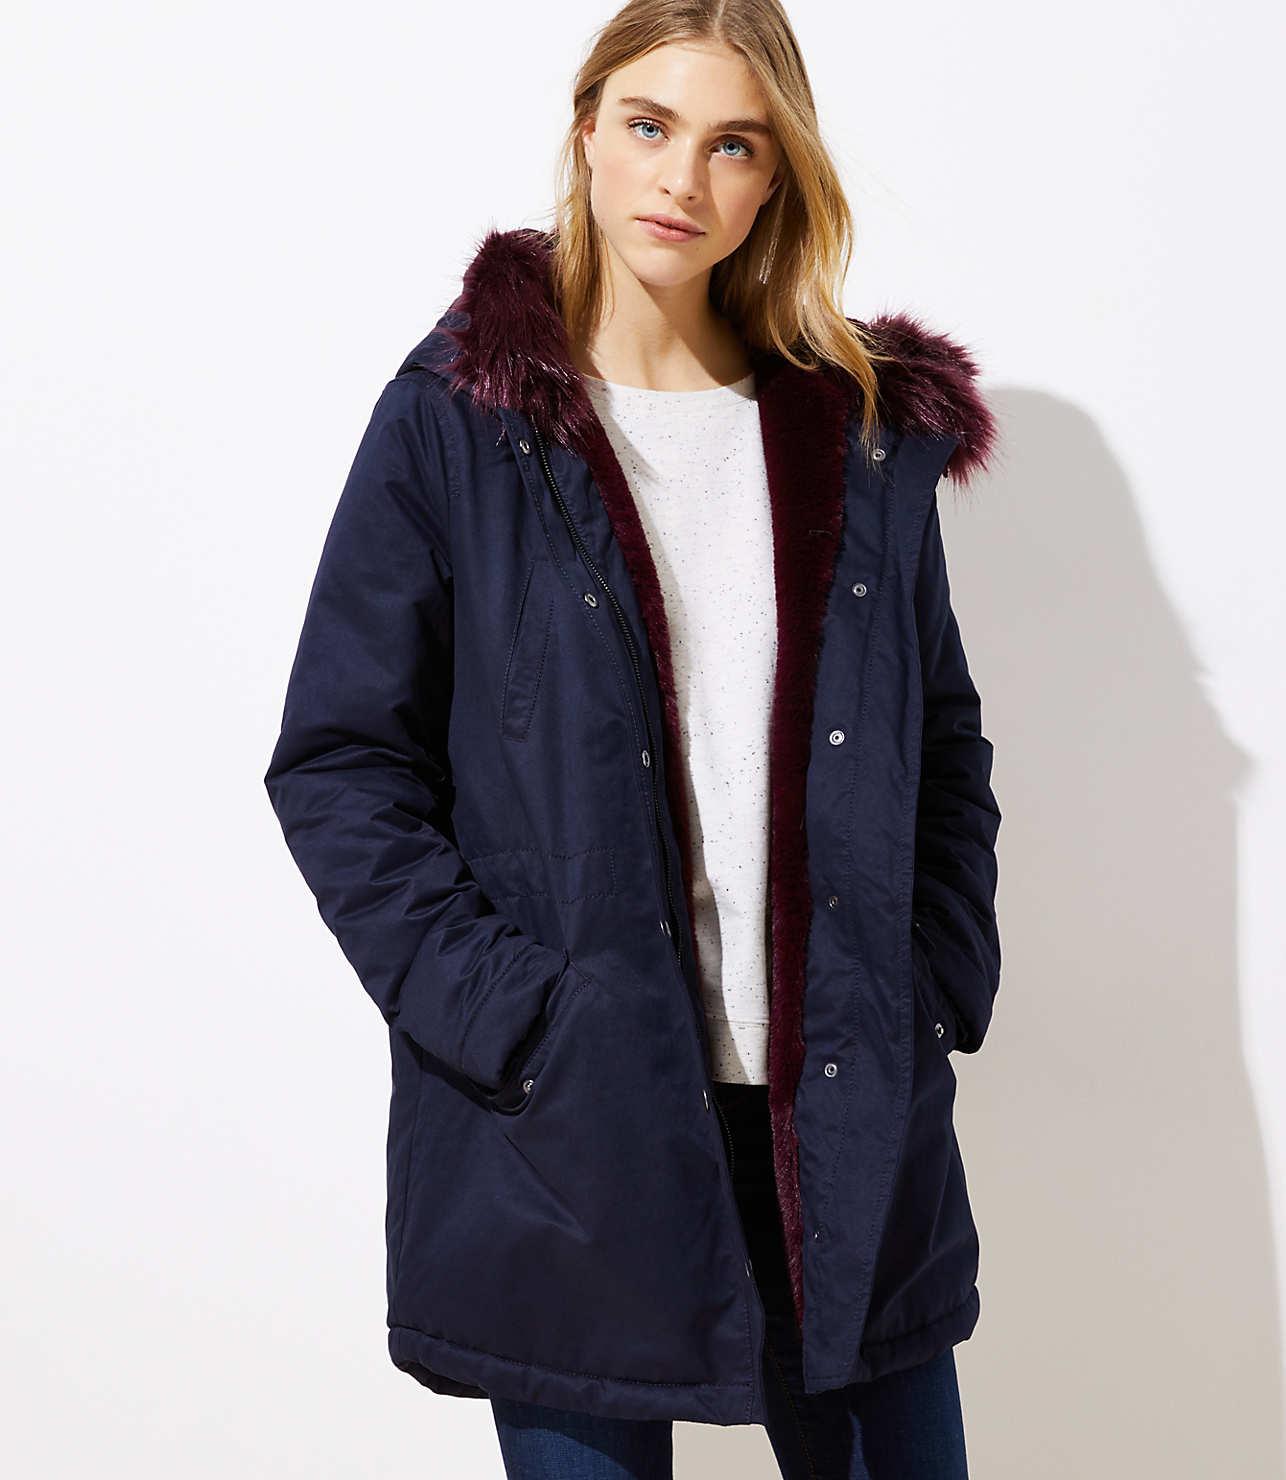 innovative design fdd74 699e3 Faux Fur Lined Parka | LOFT